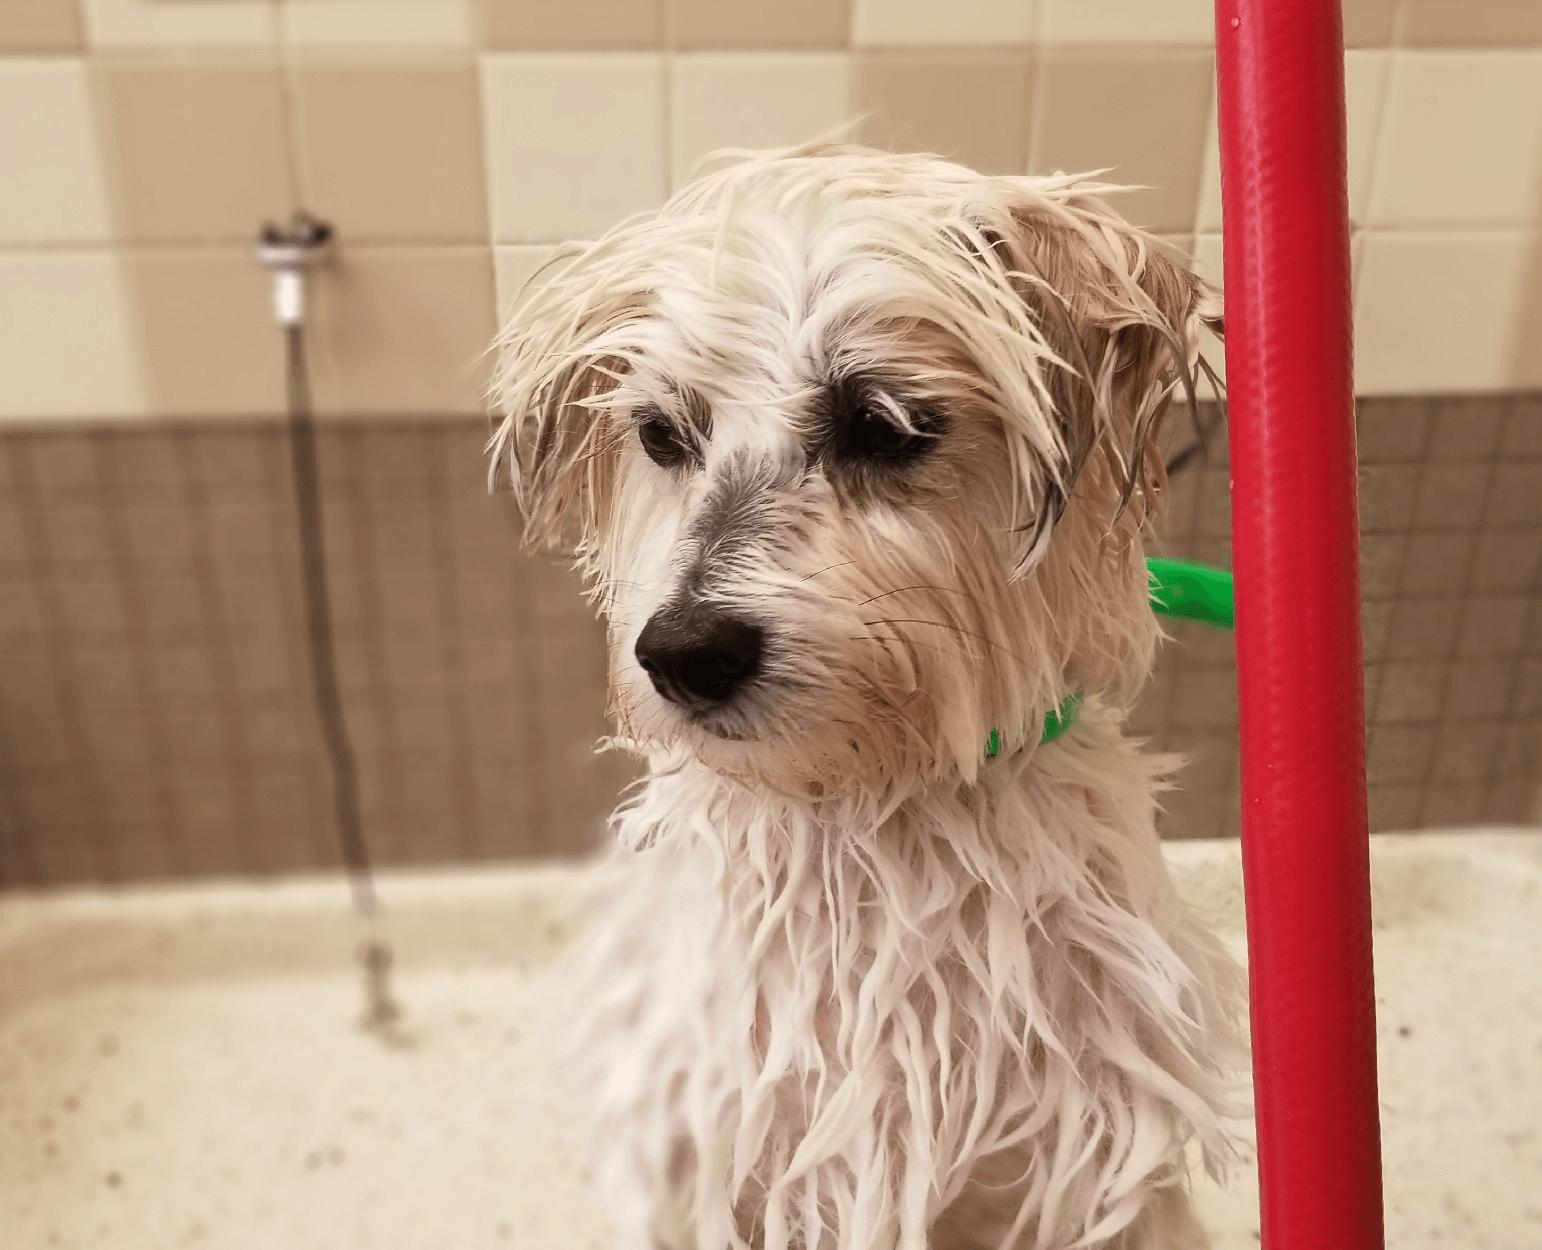 Dog at the Self Service Pet Wash